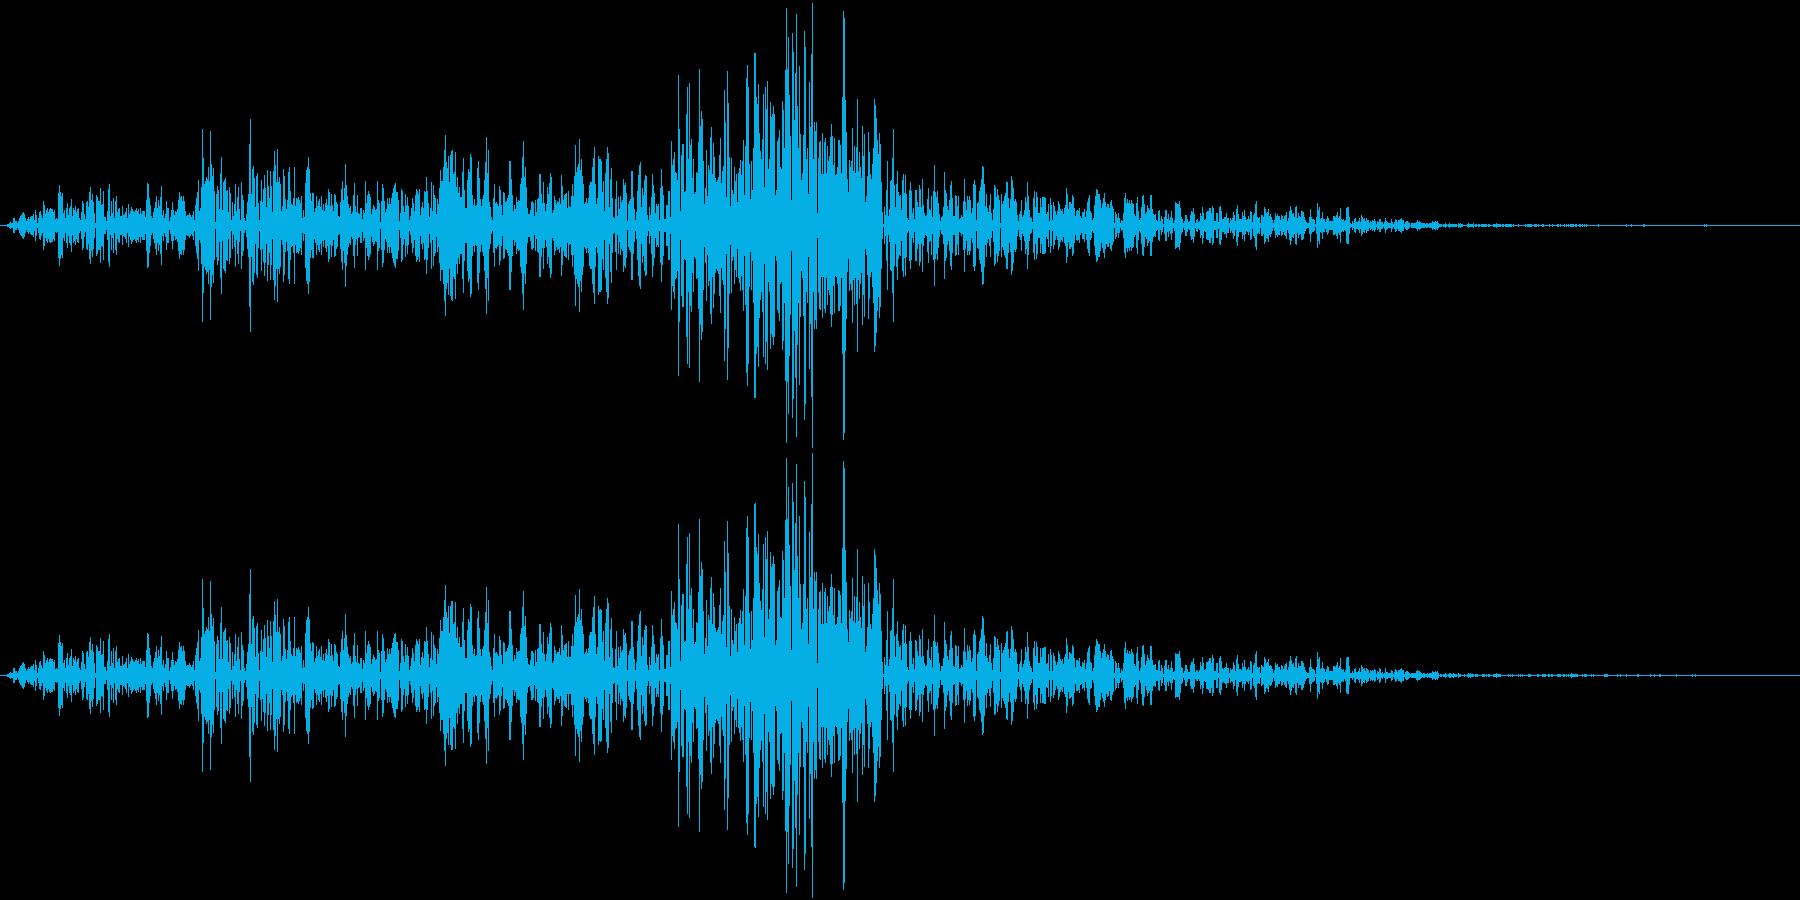 Lighter ライターの音 ジッ 1の再生済みの波形